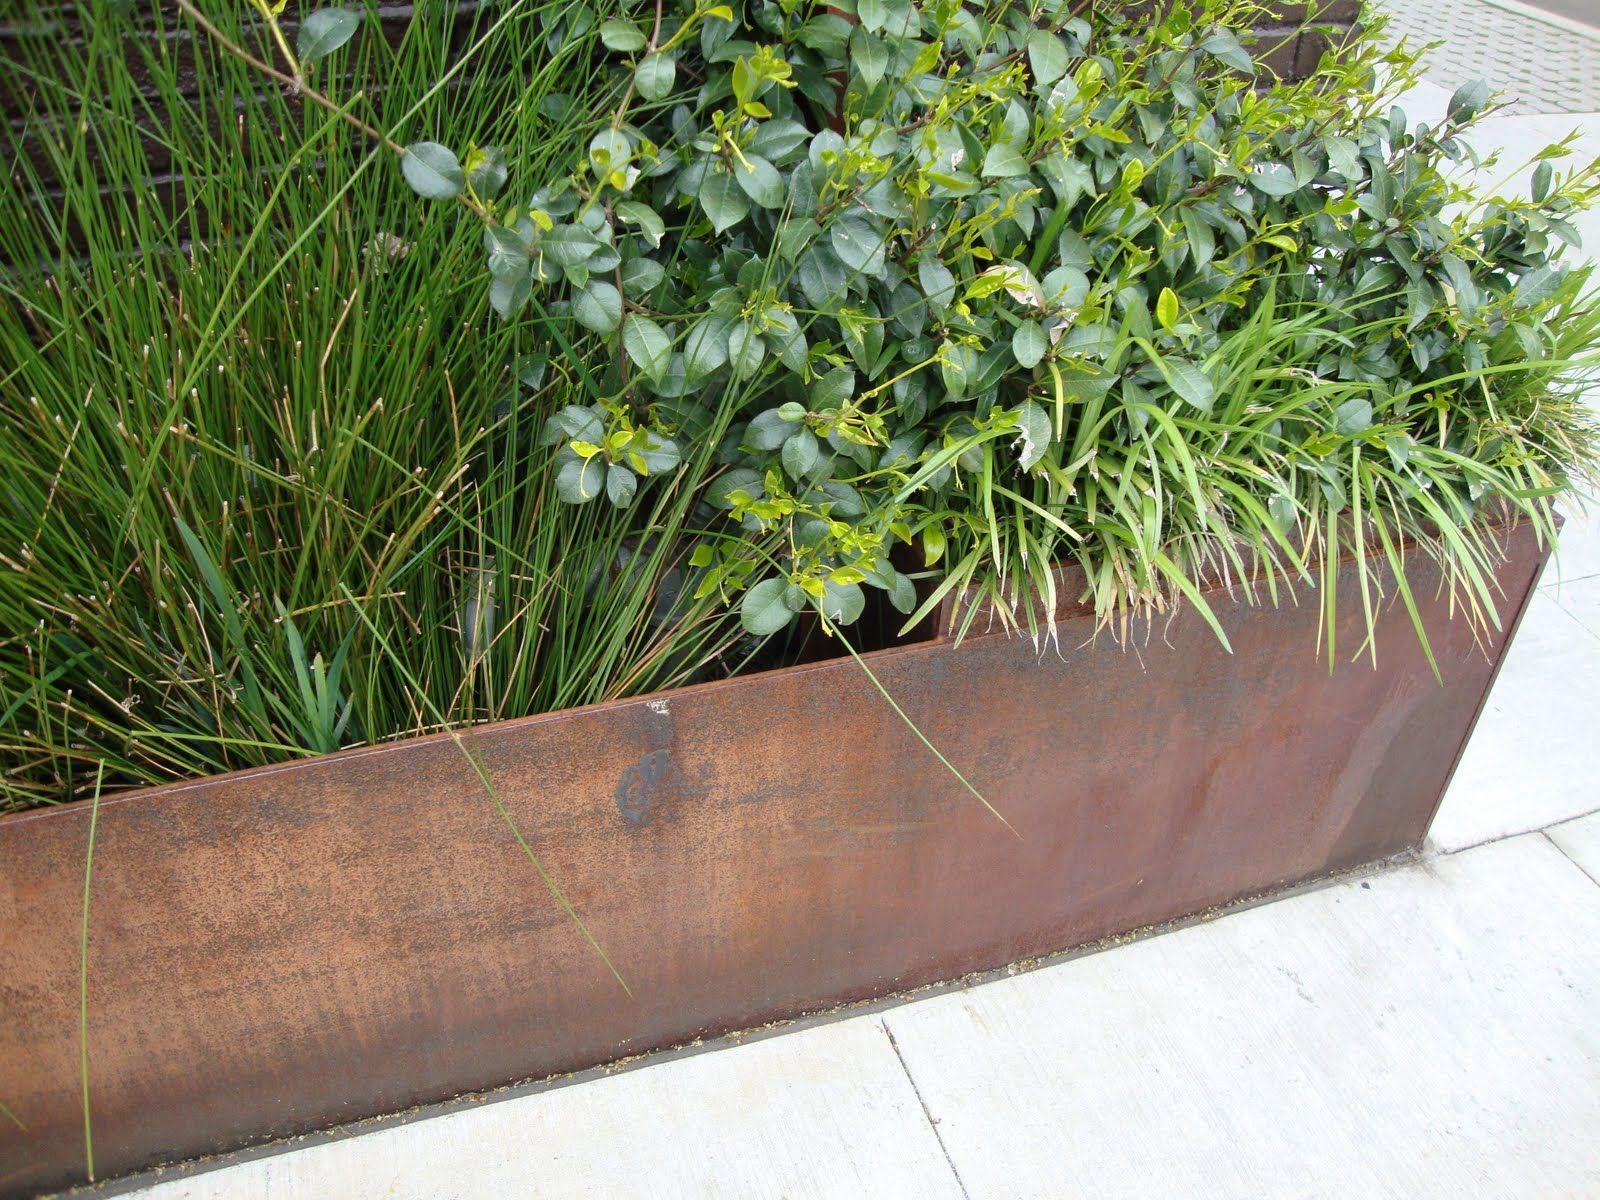 bordure en metal jardin pinterest bordure ext rieur et jardins. Black Bedroom Furniture Sets. Home Design Ideas